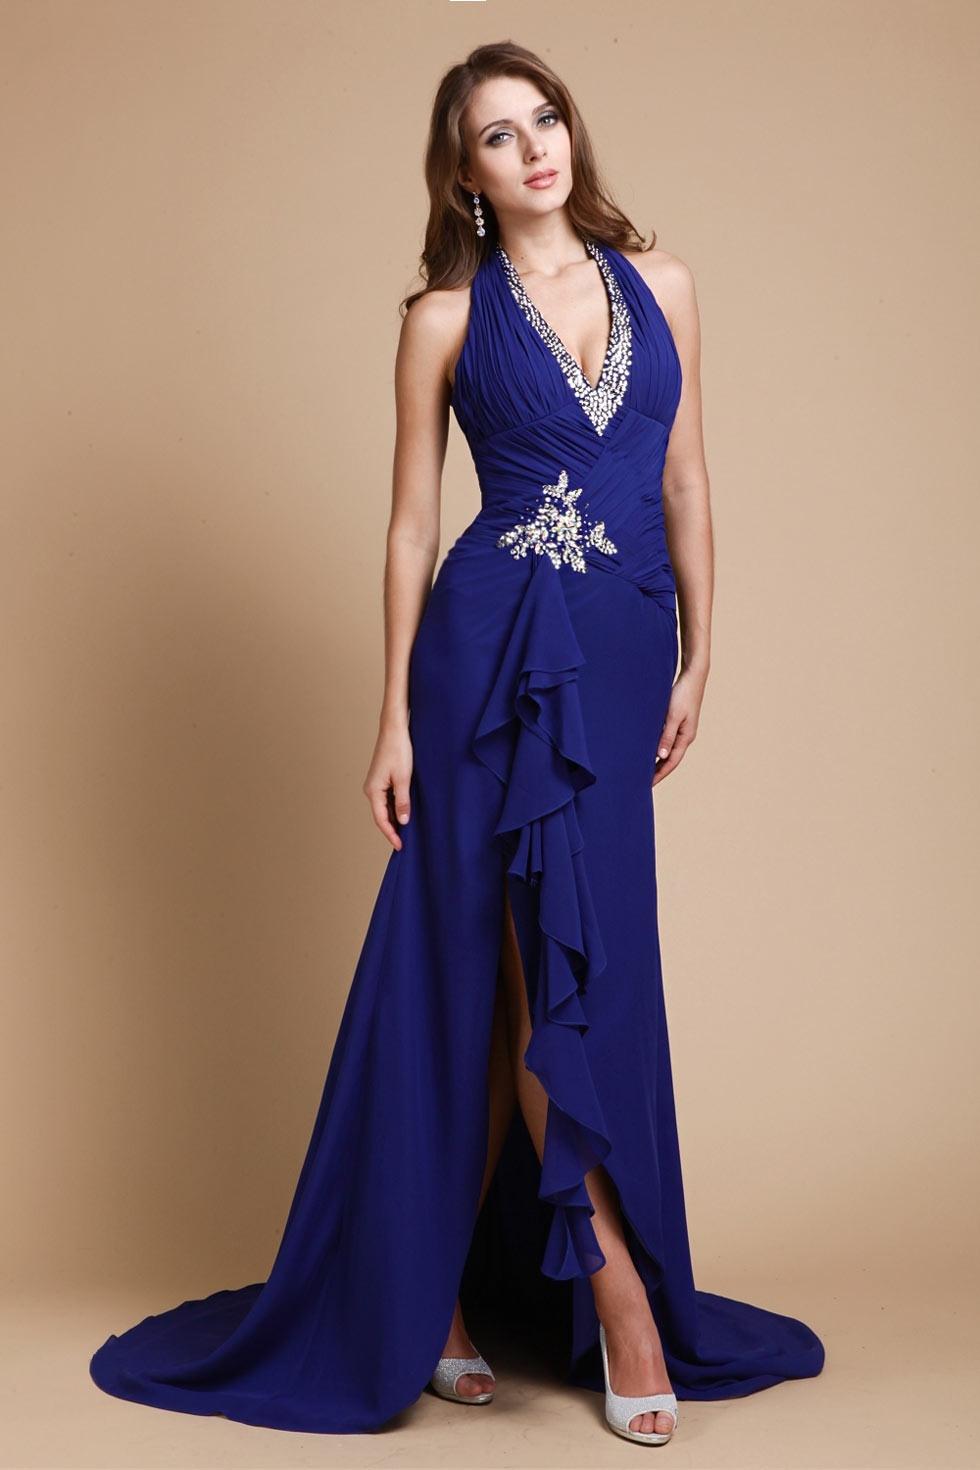 Formal Einfach Dunkelblaues Langes Kleid Vertrieb - Abendkleid